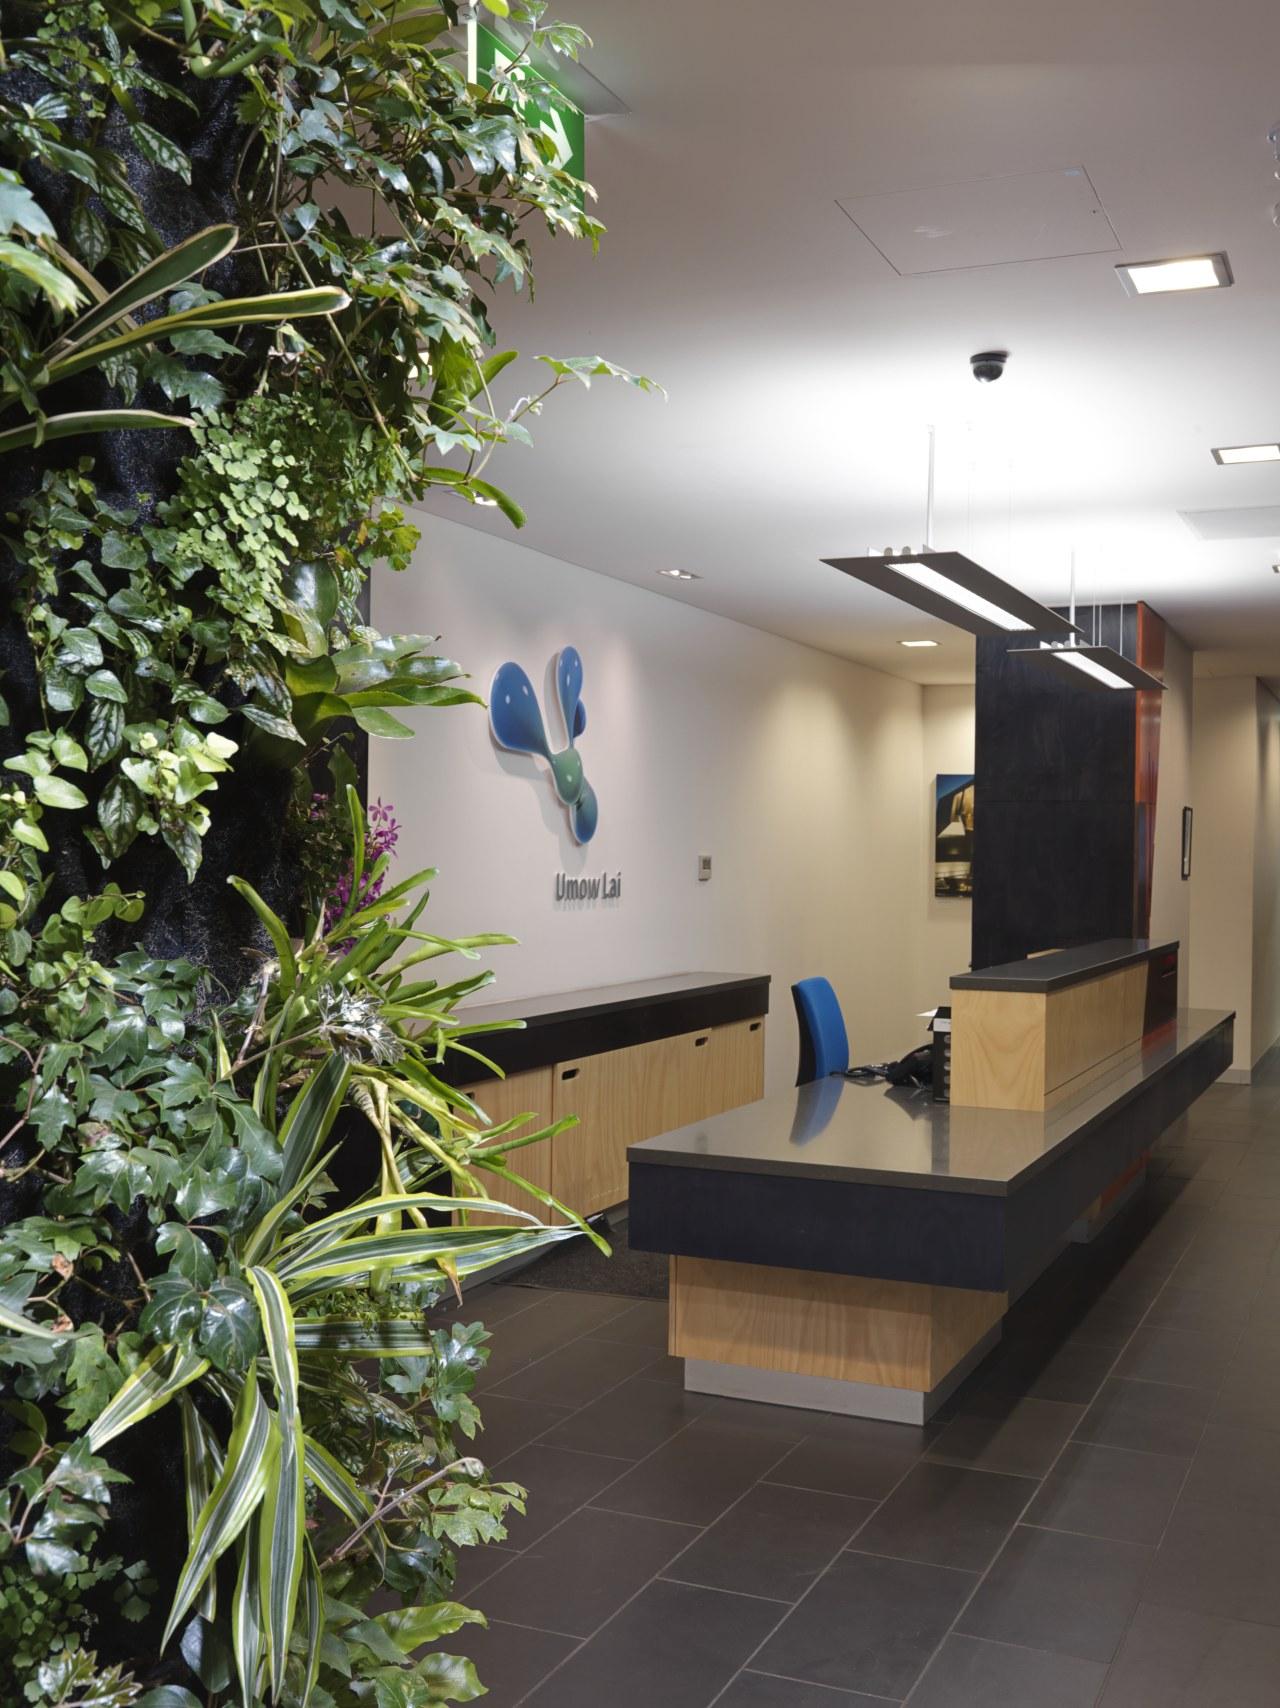 Desks are positioned to take advantage of maximum architecture, house, interior design, plant, black